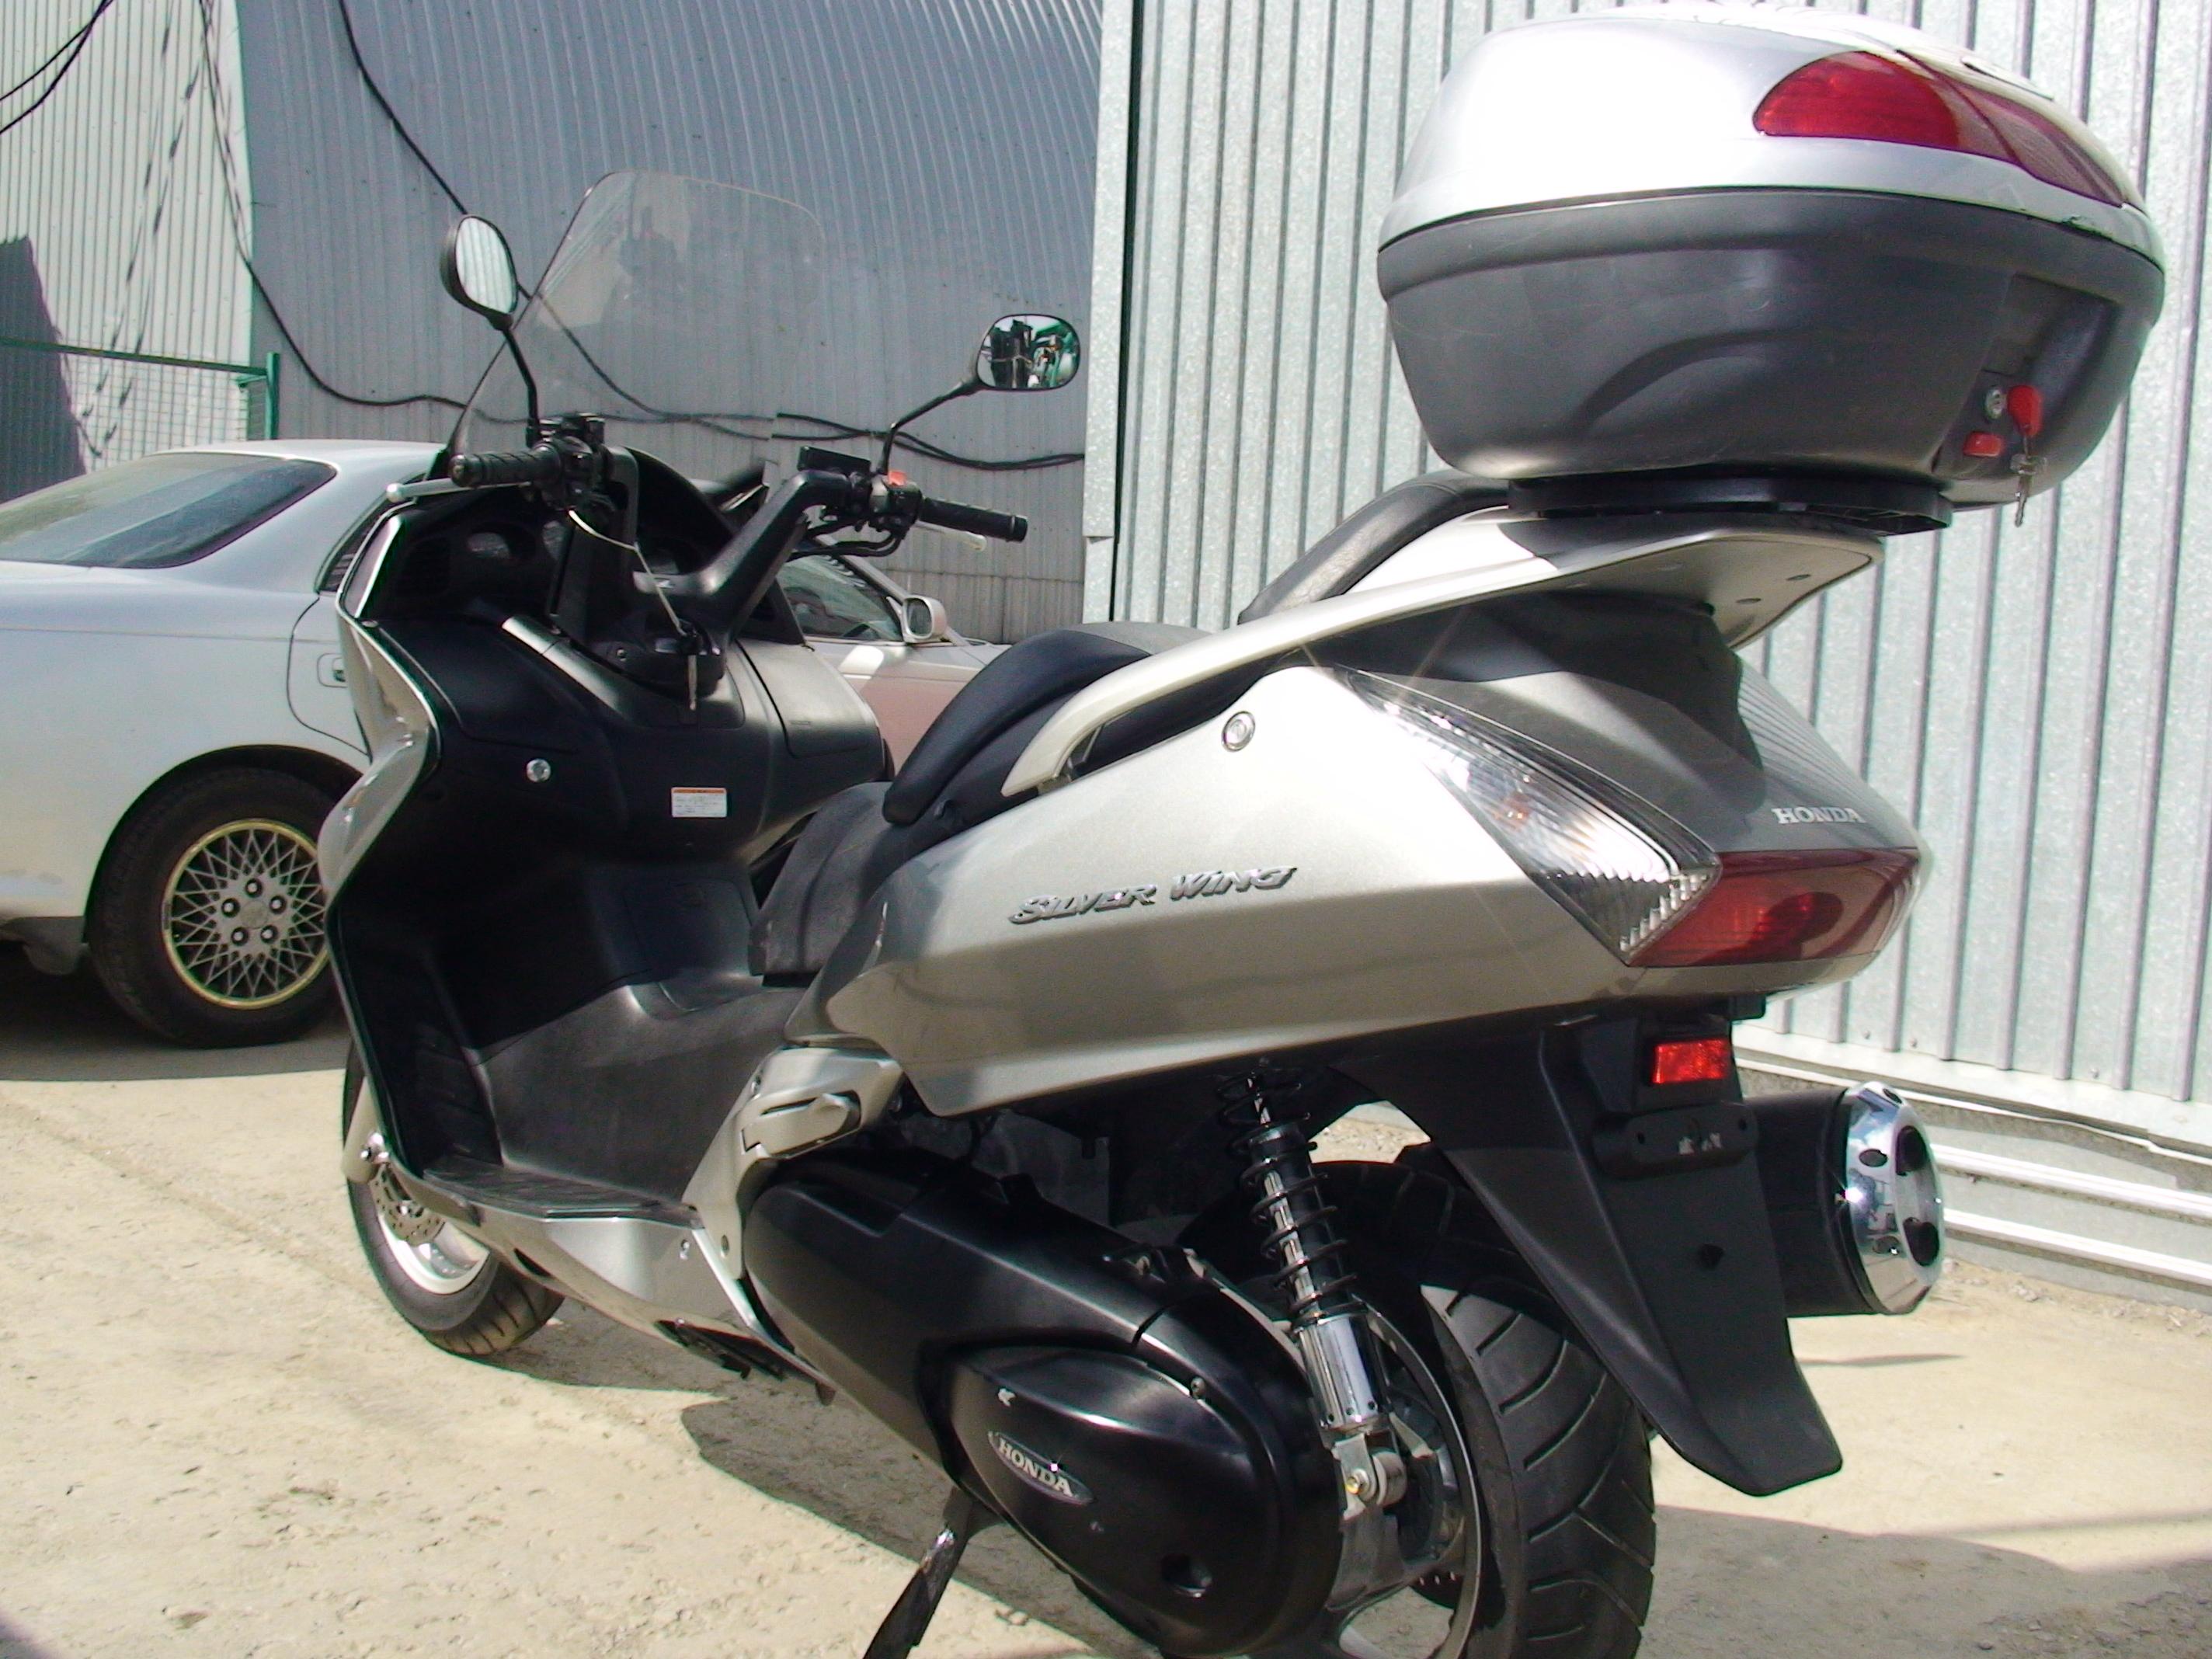 honda silver wing 400, 2002 г.в.